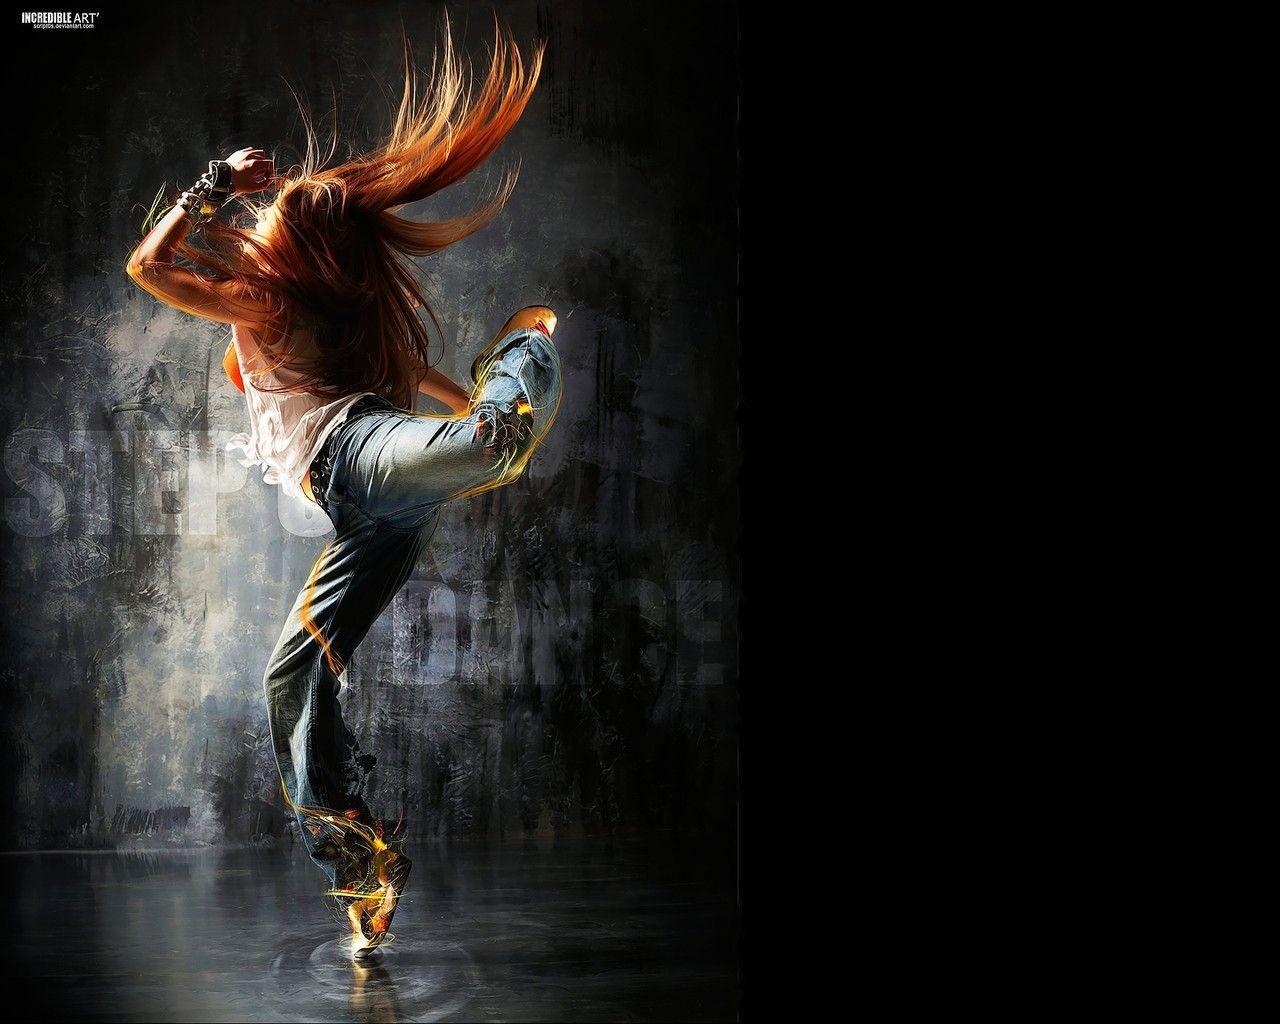 Hip Hop Dance Wallpapers Top Free Hip Hop Dance Backgrounds Wallpaperaccess